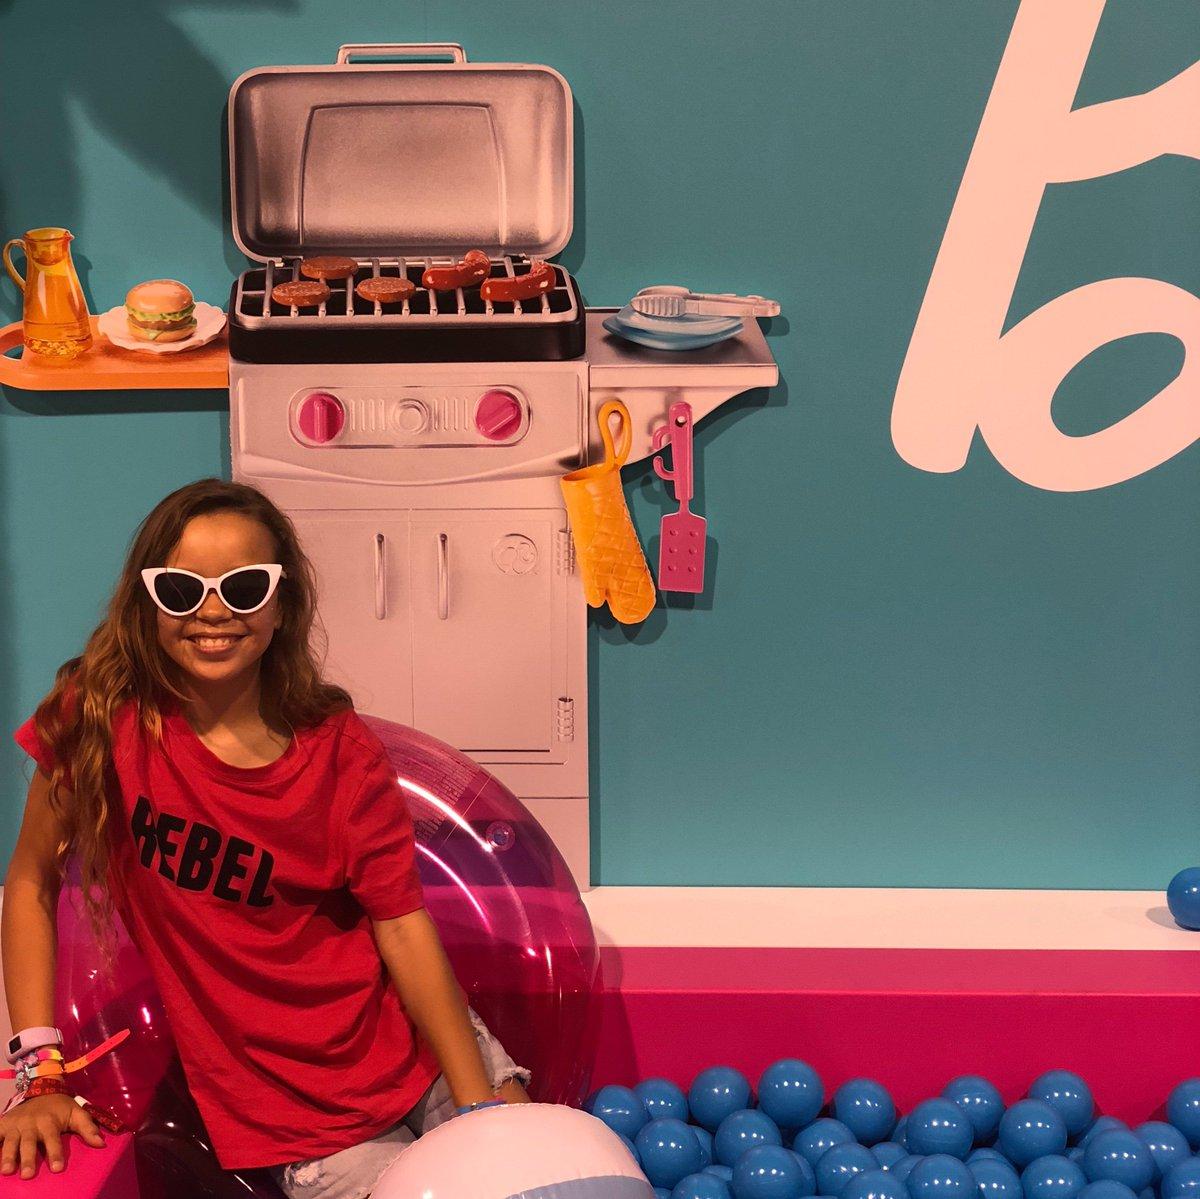 Welcome to the Dreamhouse, @VidCon! ✌️#Barbie #VidCon2019